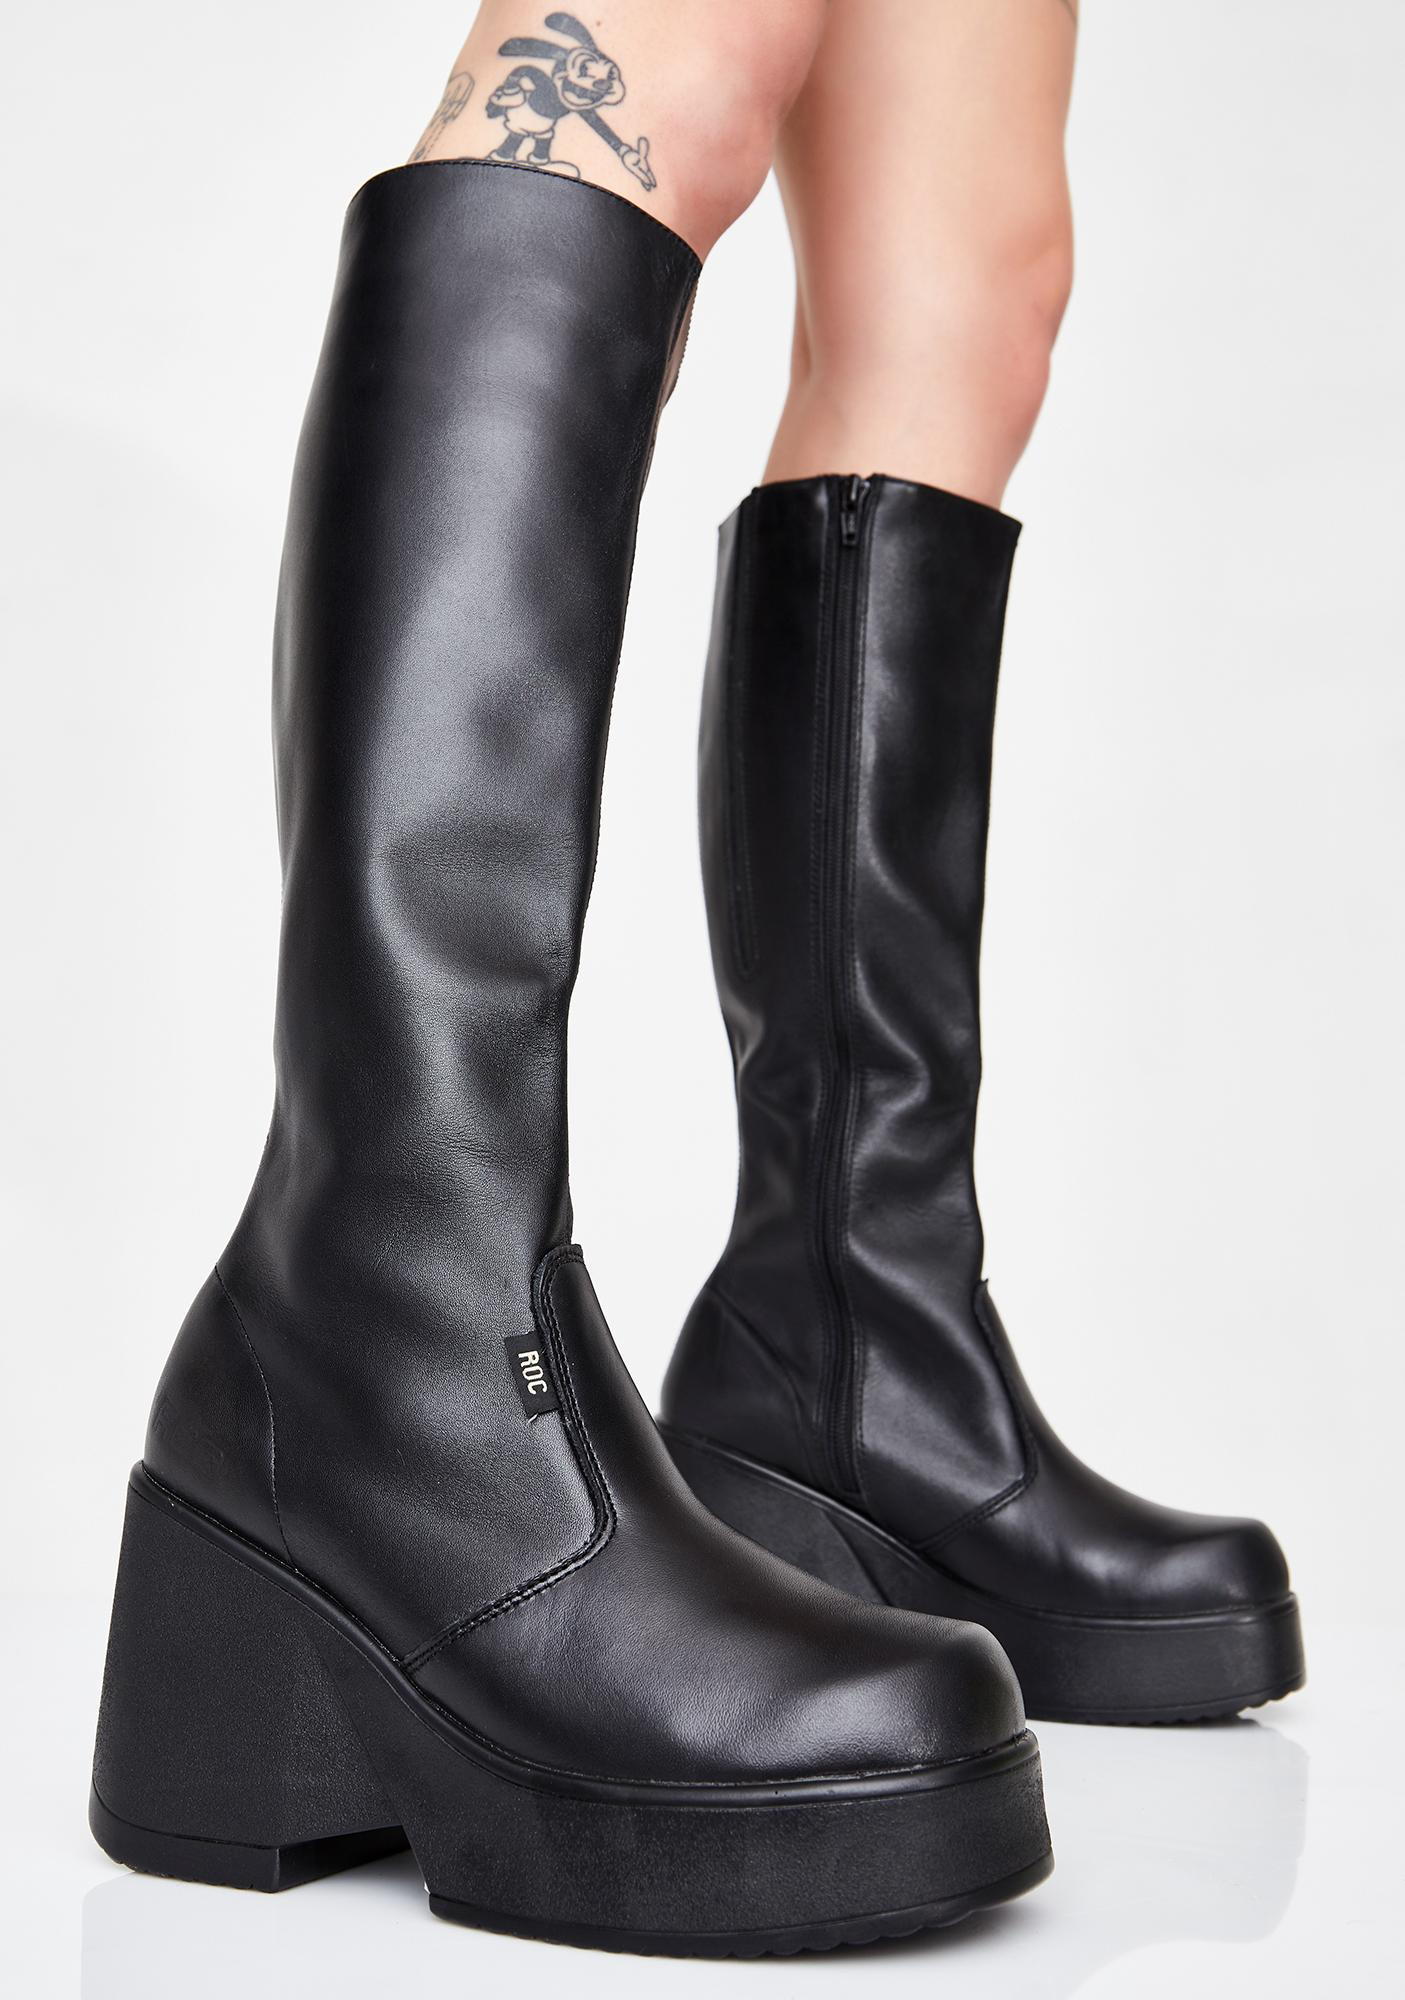 90b4ab89a50 ROC Boots Australia Pharaoh Wedge Boots | Dolls Kill